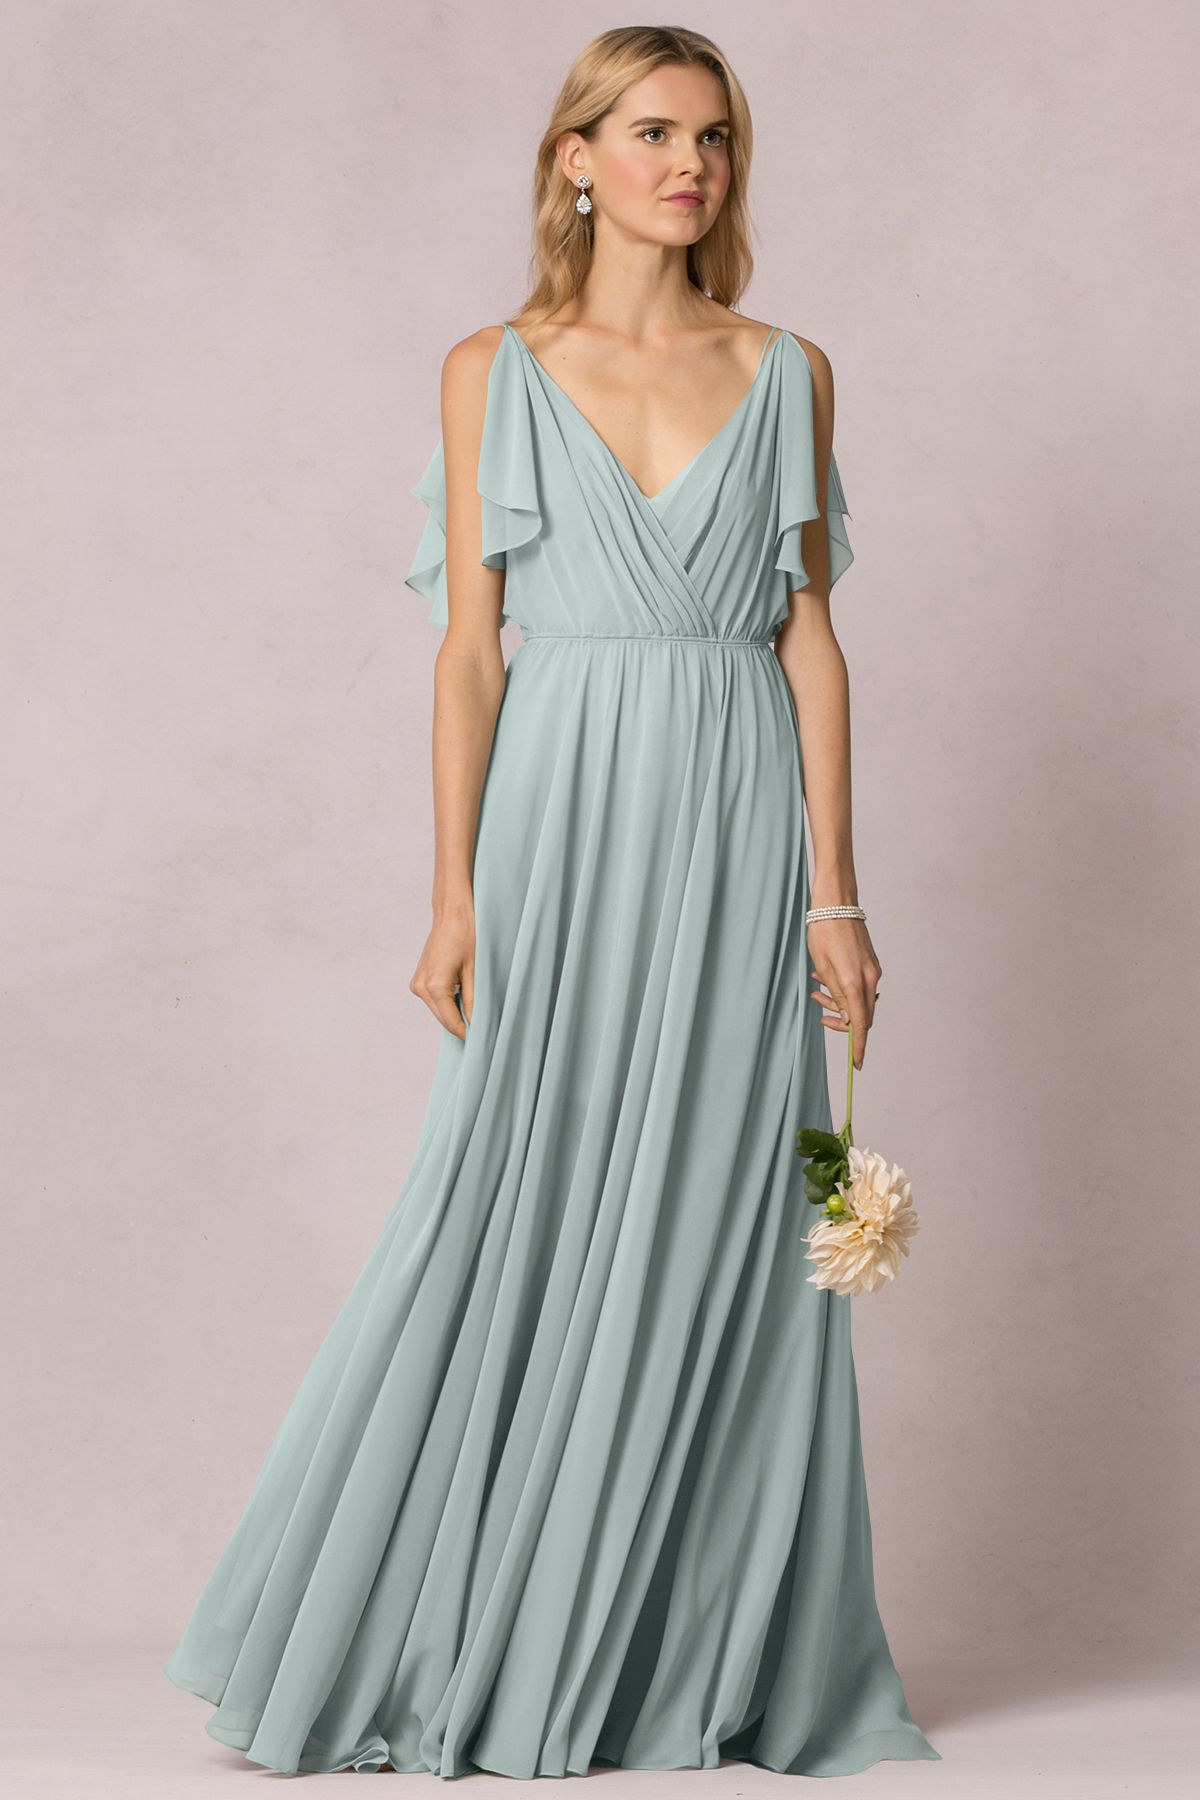 98ee1b55e1a Jenny Yoo Cassie - Morning Mist The dress!! -christine